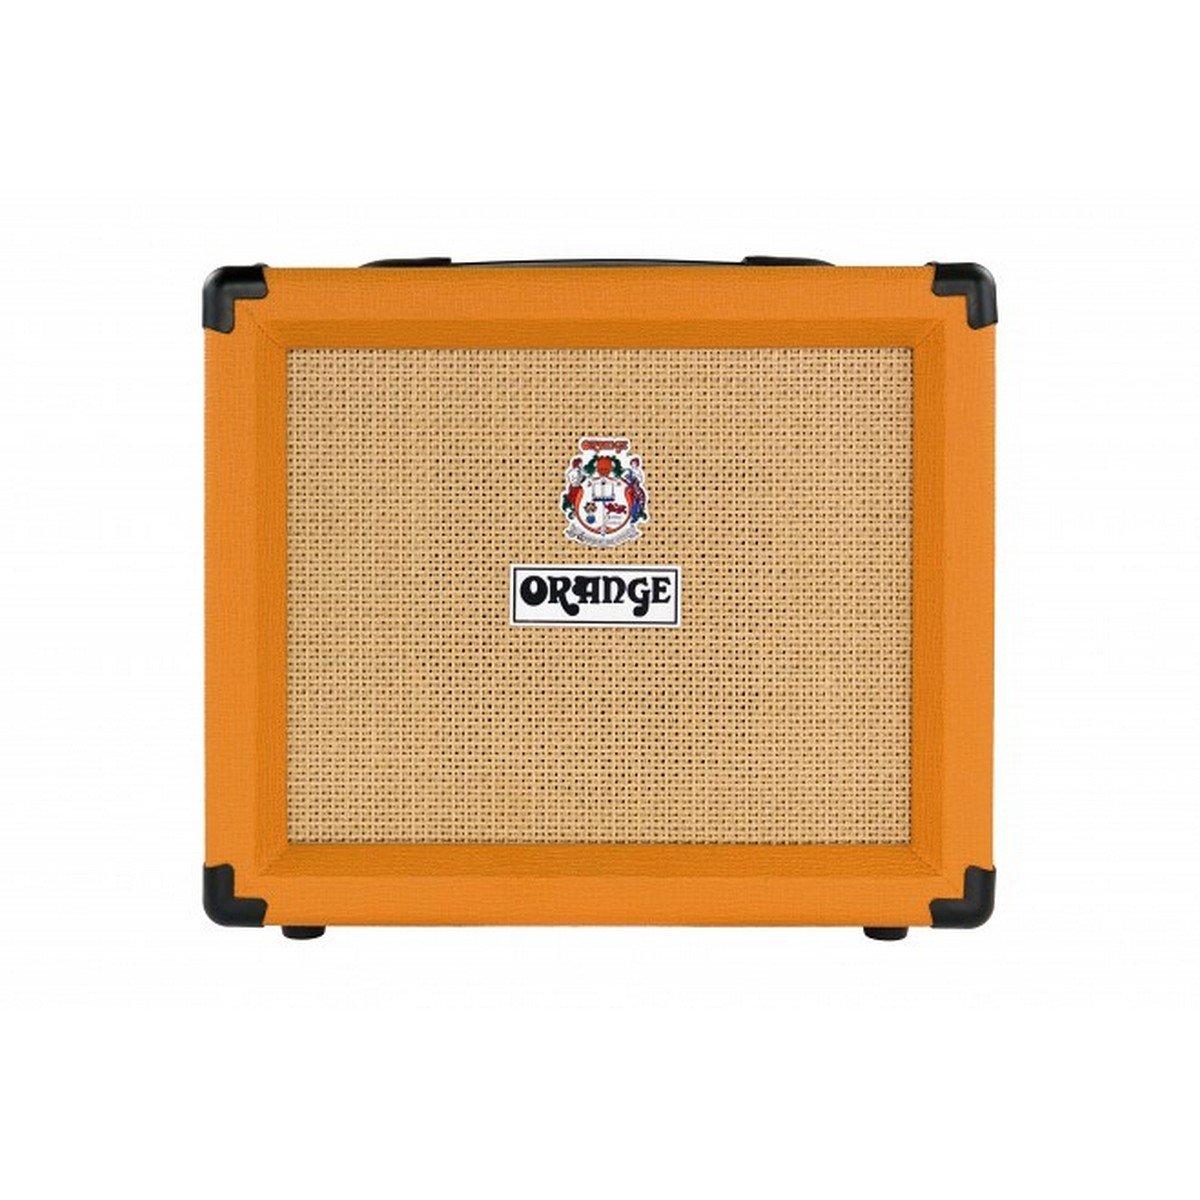 Orange Amps Electric Guitar Power Amplifier, Orange (Crush20RT) by Orange Amps